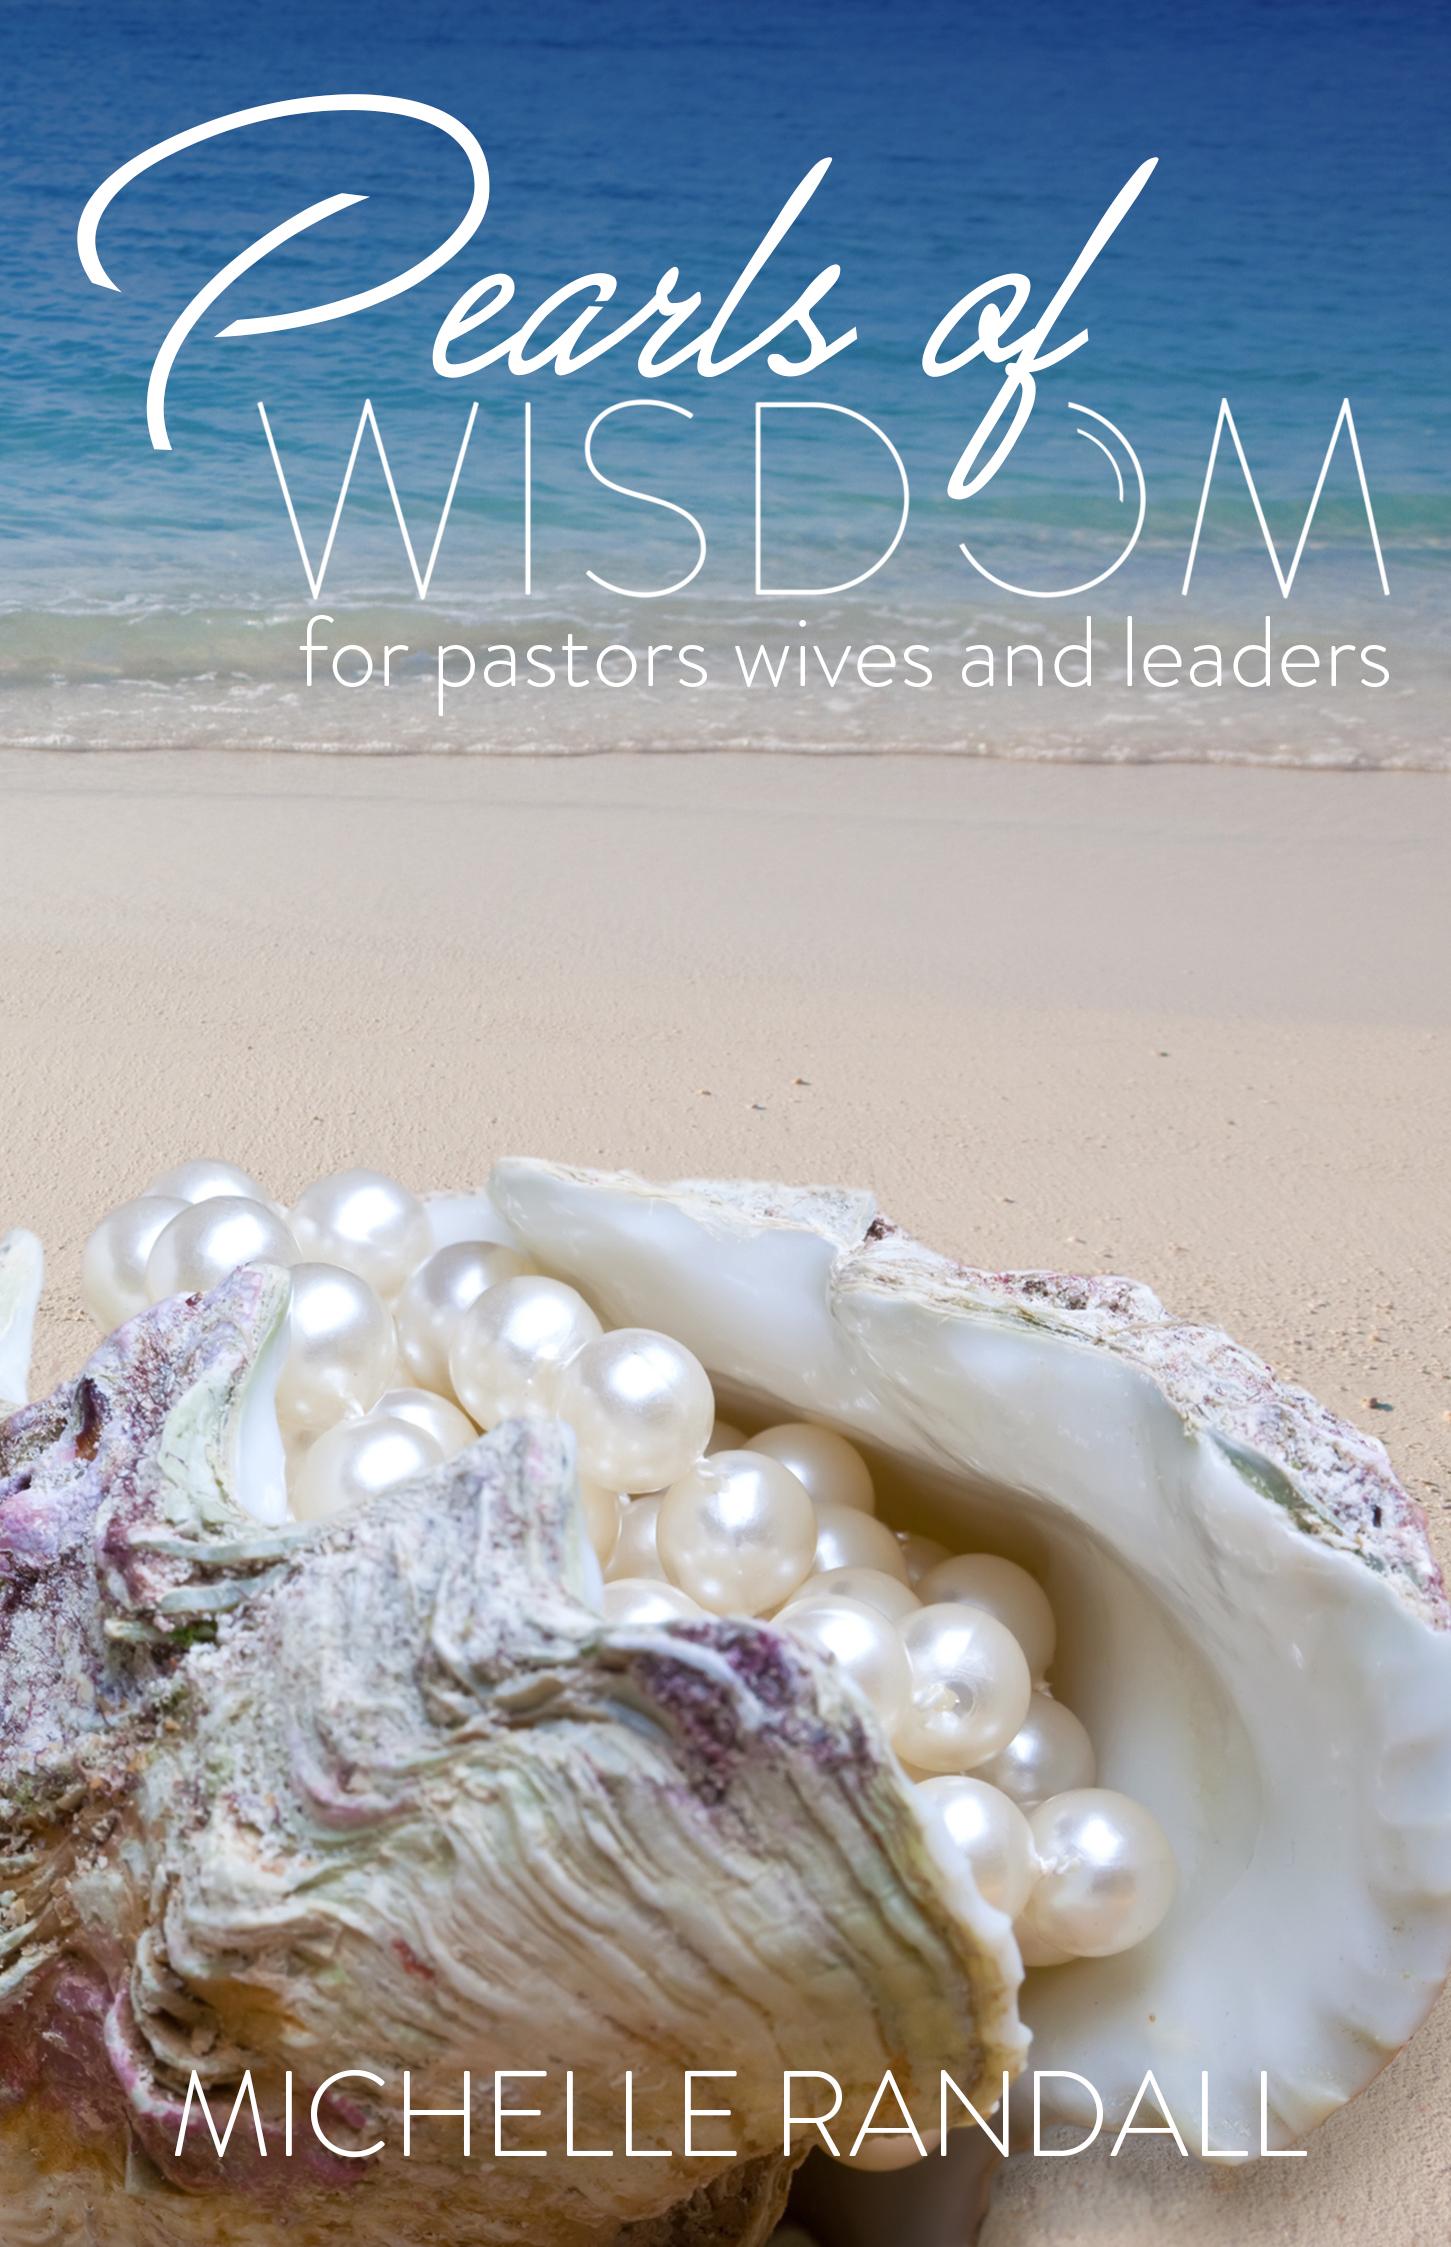 michelle_randall_book_Pearls_of_Wisdom.jpg